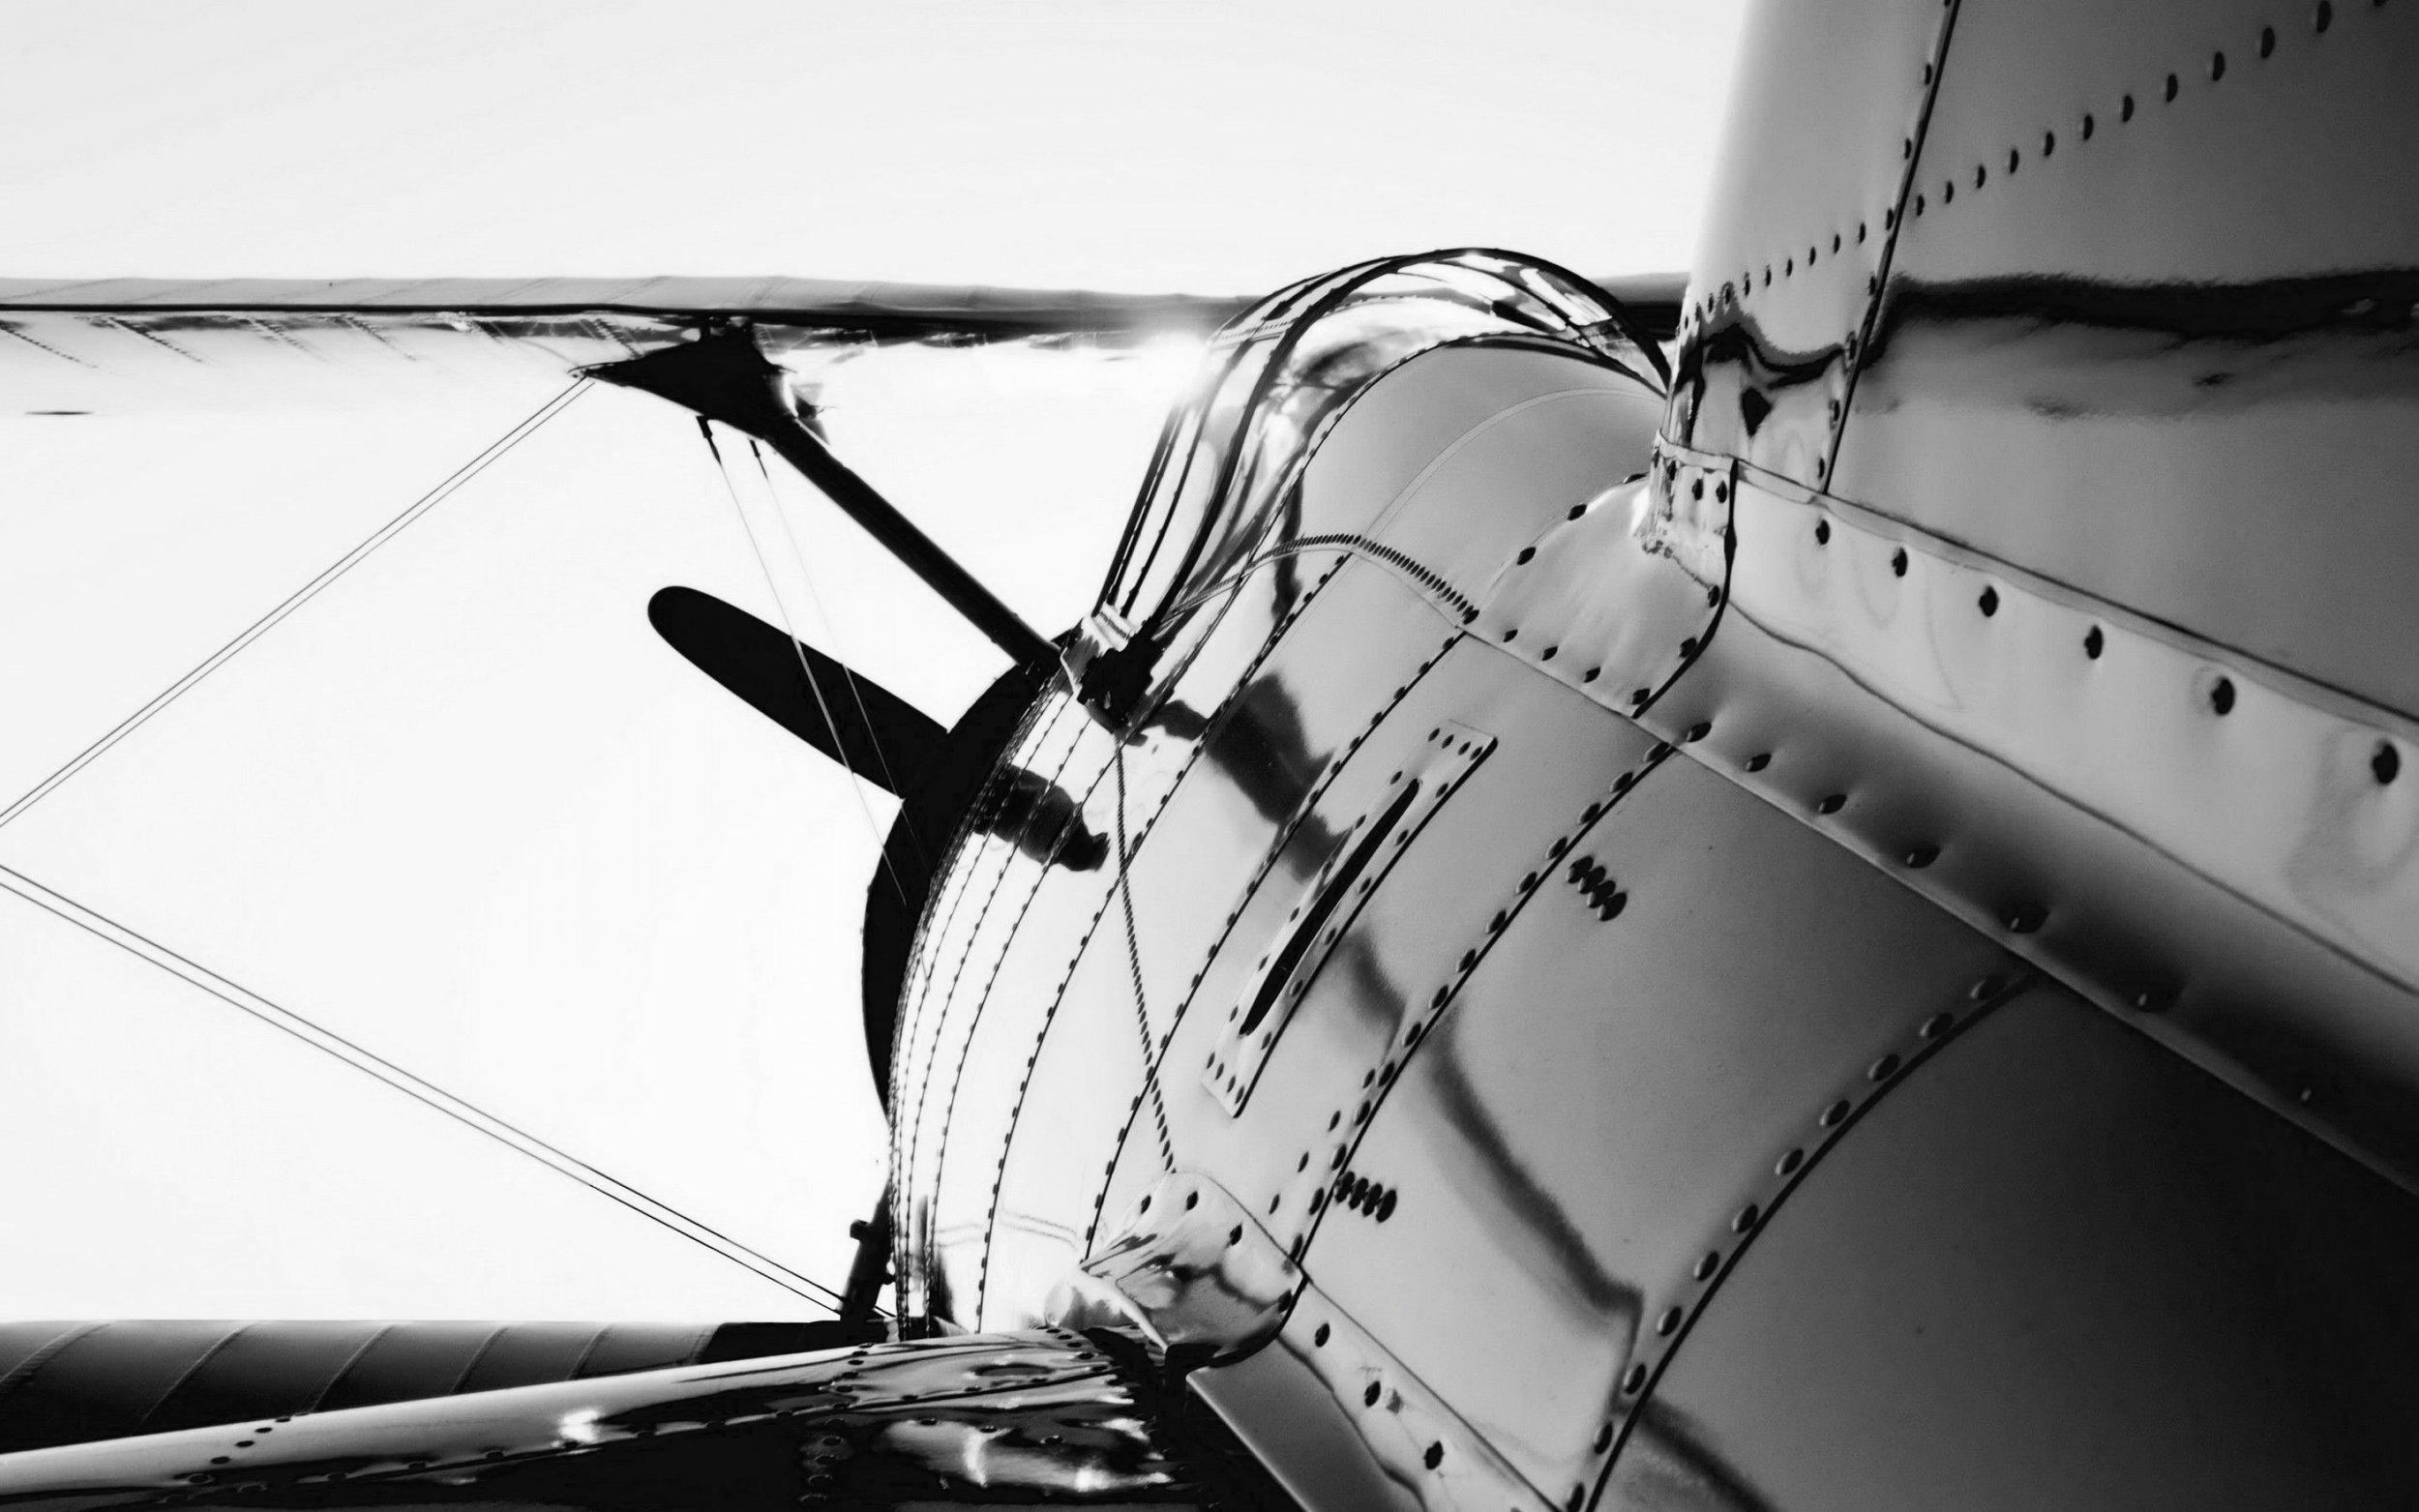 avion-253050.jpg